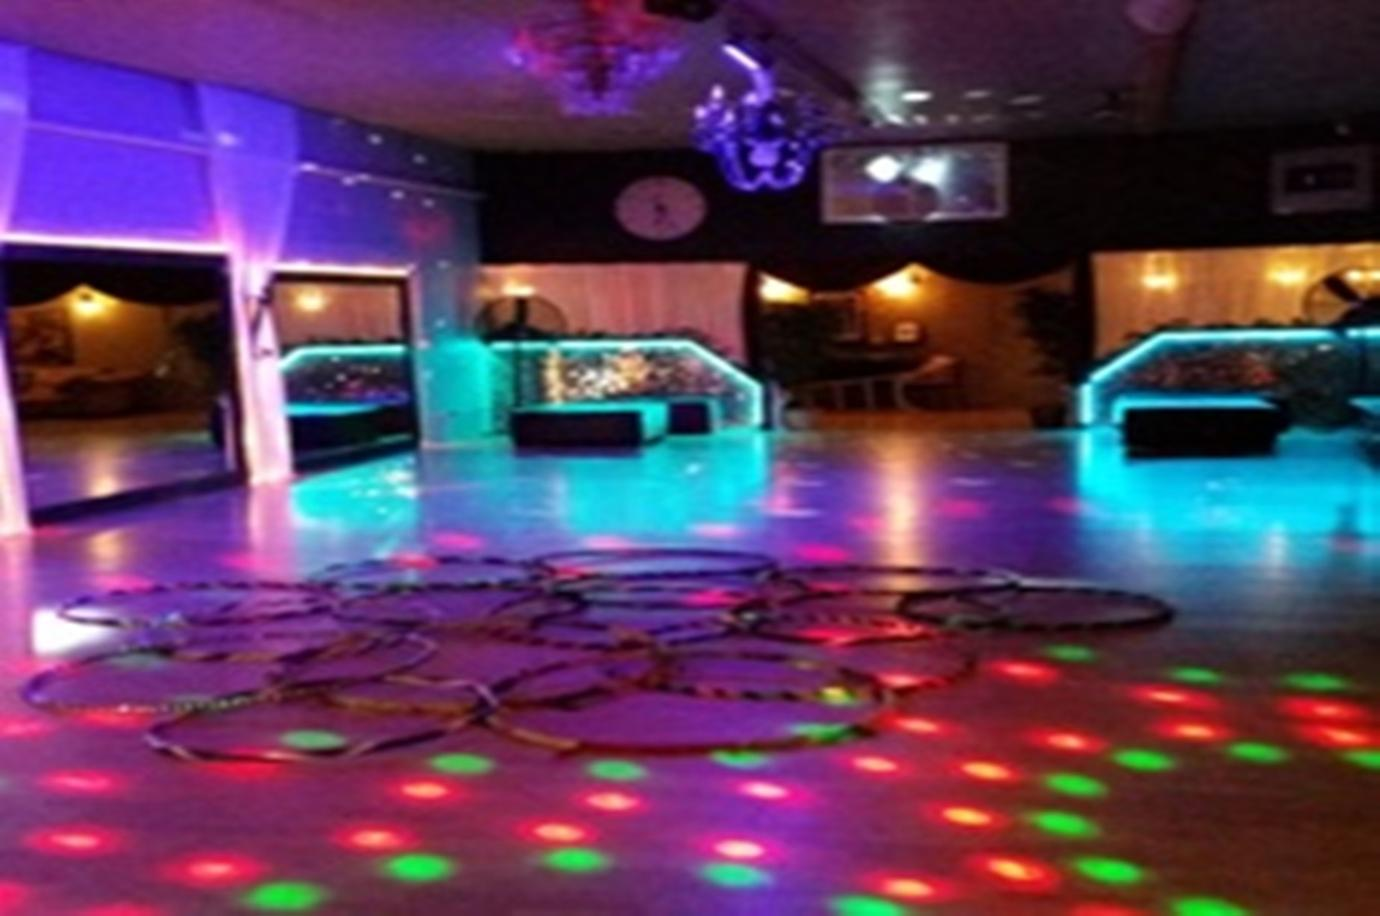 Studio 6 Ballroom Event Hall and Studios Private Event Birthday Wedding Rental Tacoma WA (3)